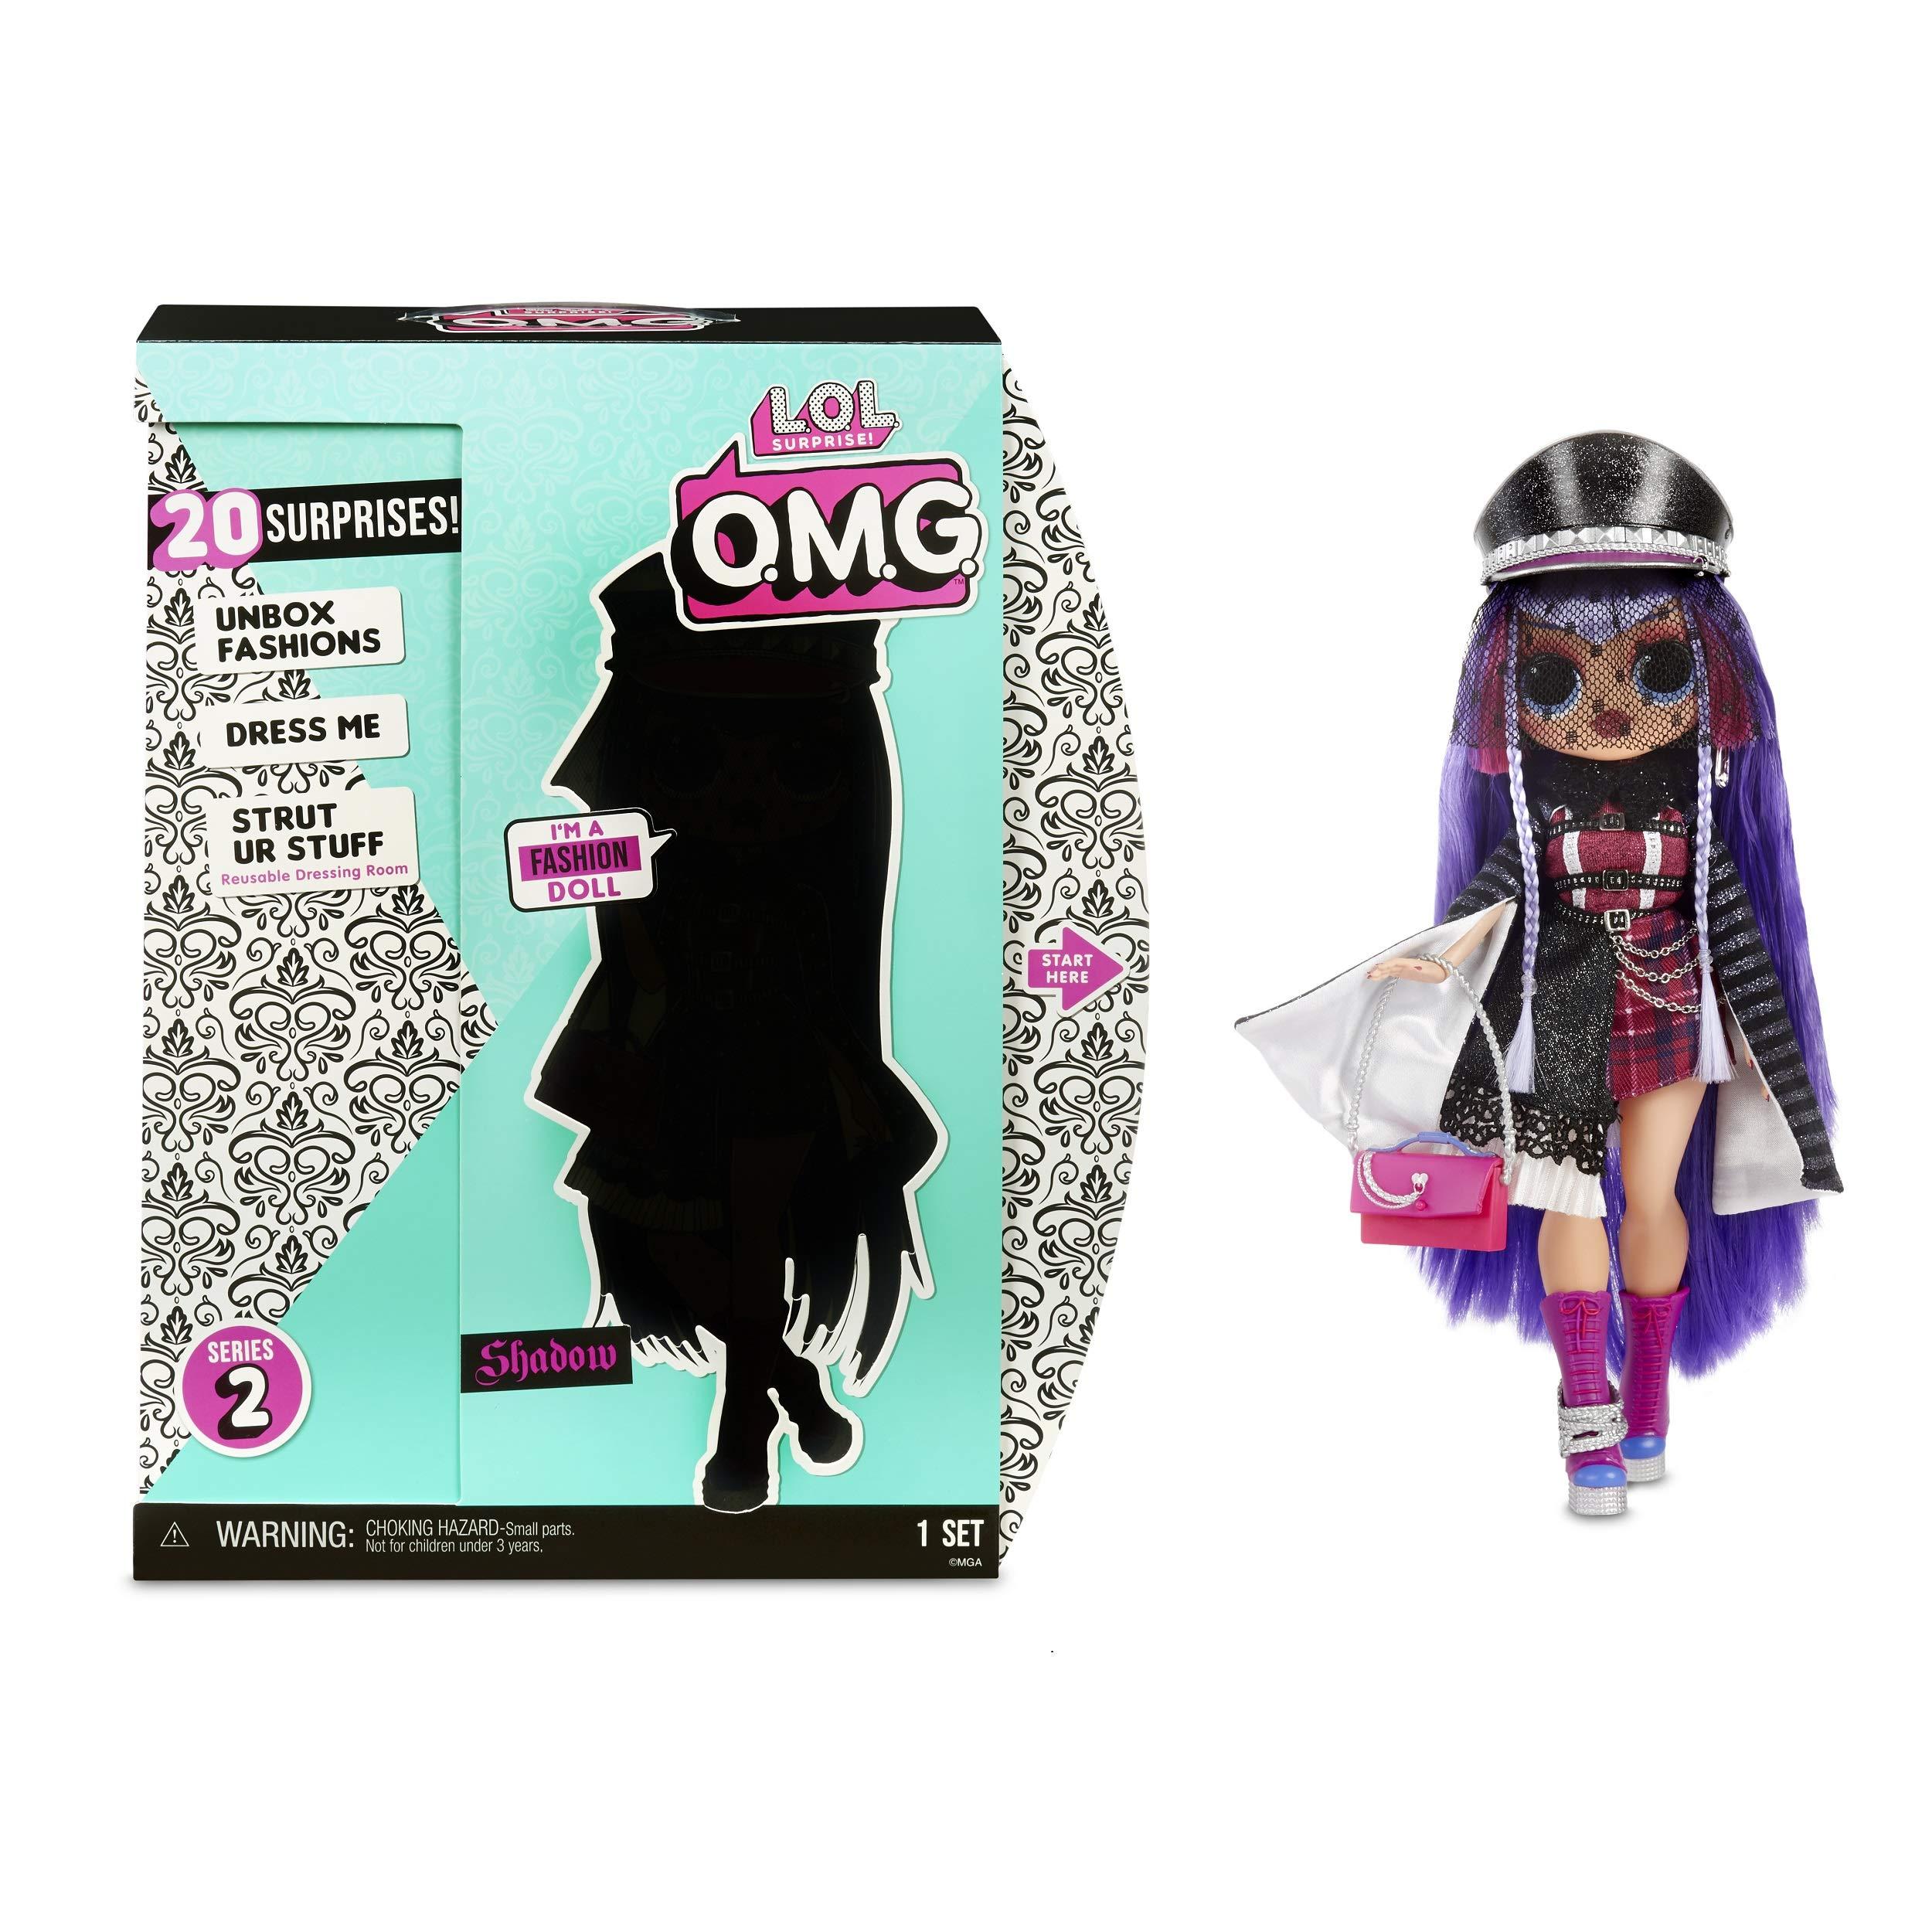 L.O.L. Surprise! OMG 2.8-Shadow